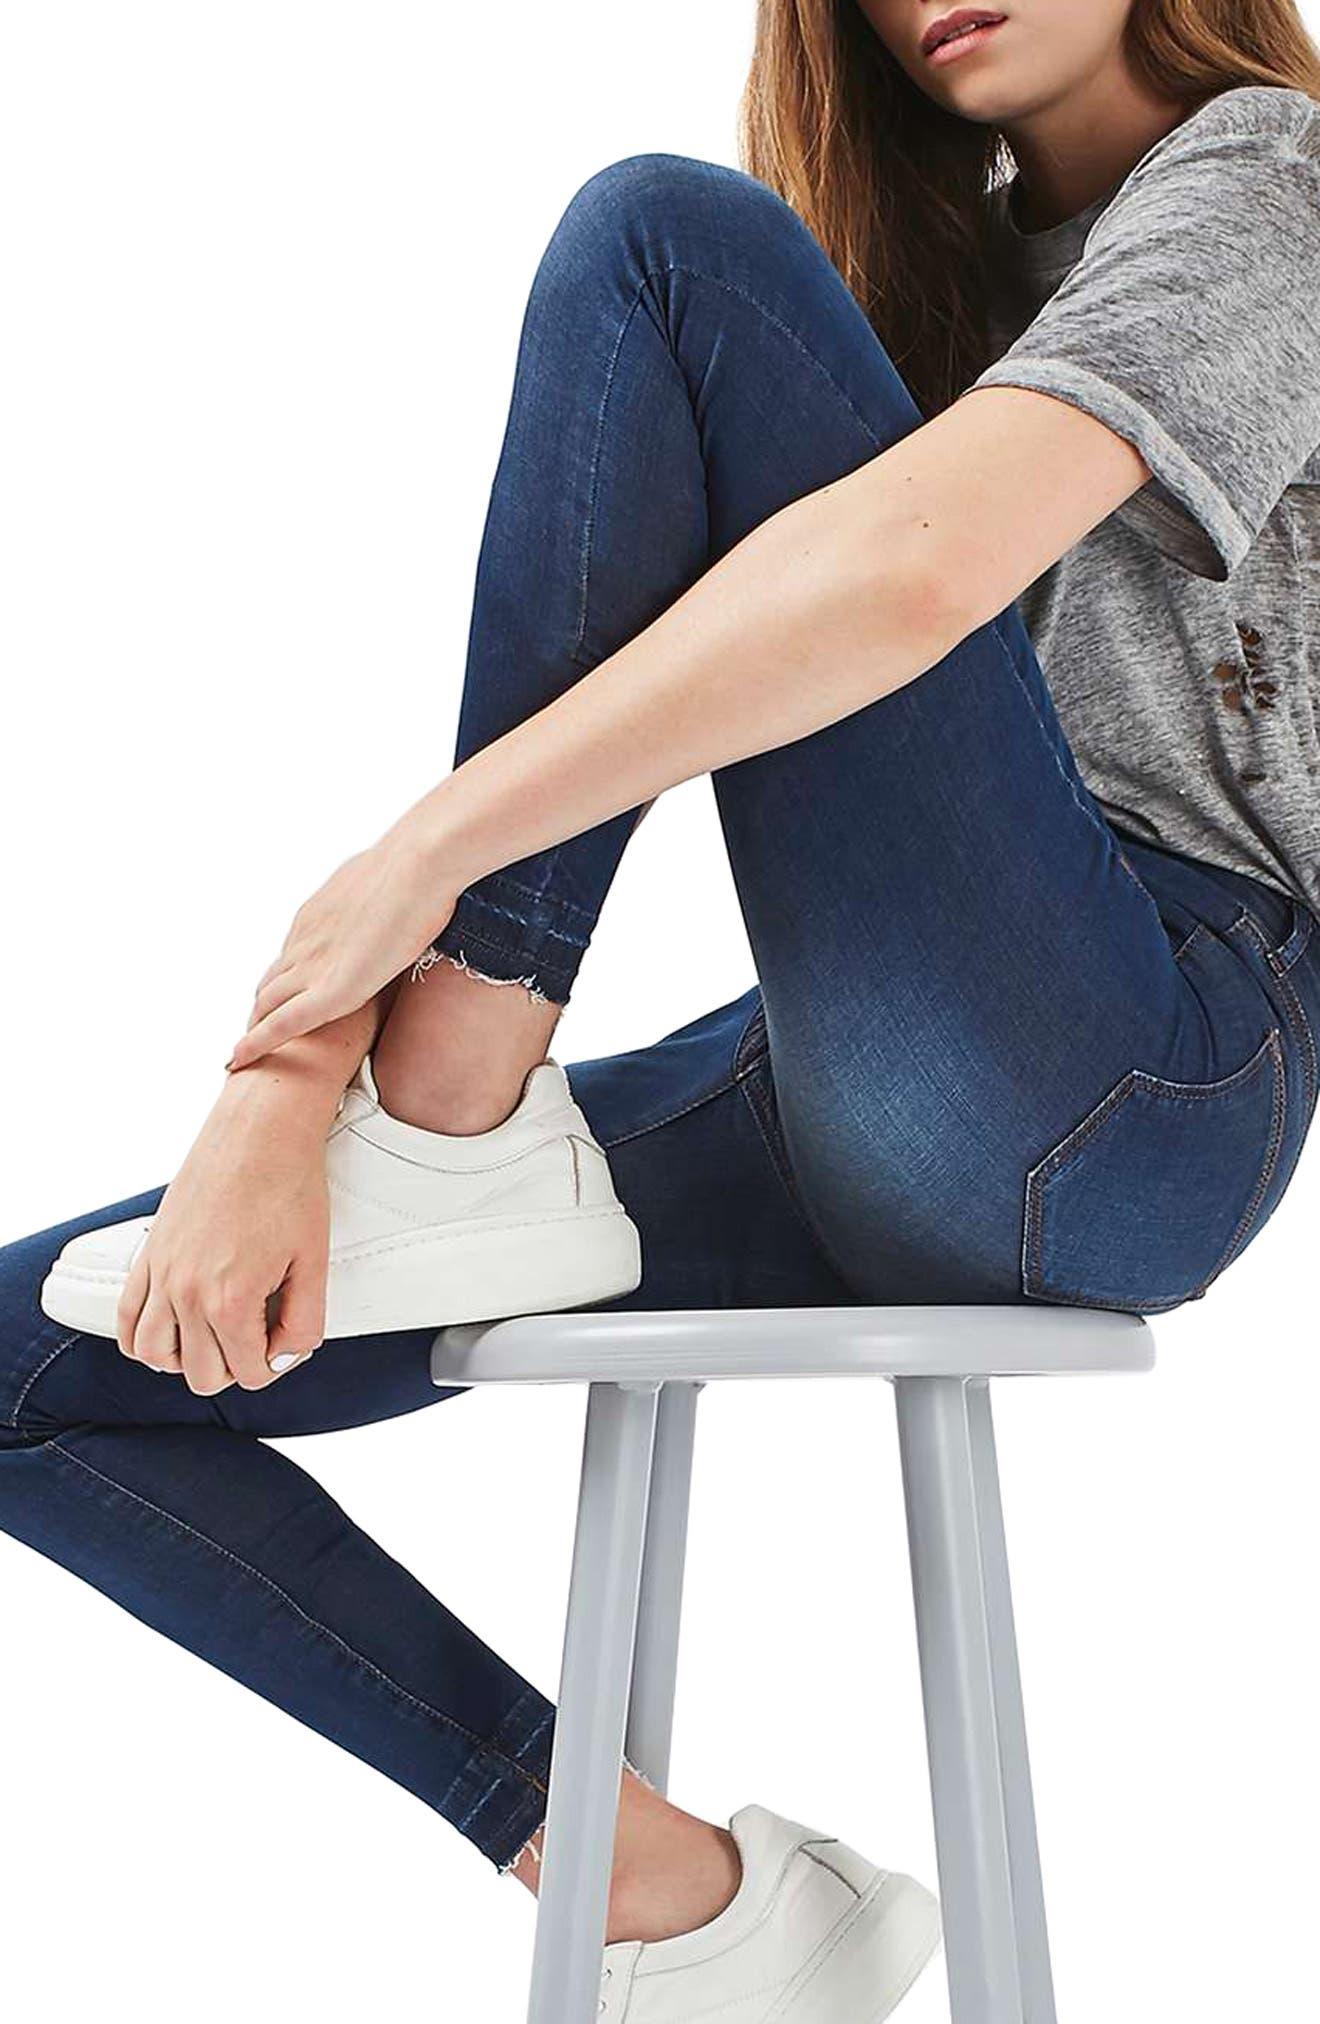 Leigh Release Hem Skinny Jeans,                             Alternate thumbnail 3, color,                             401